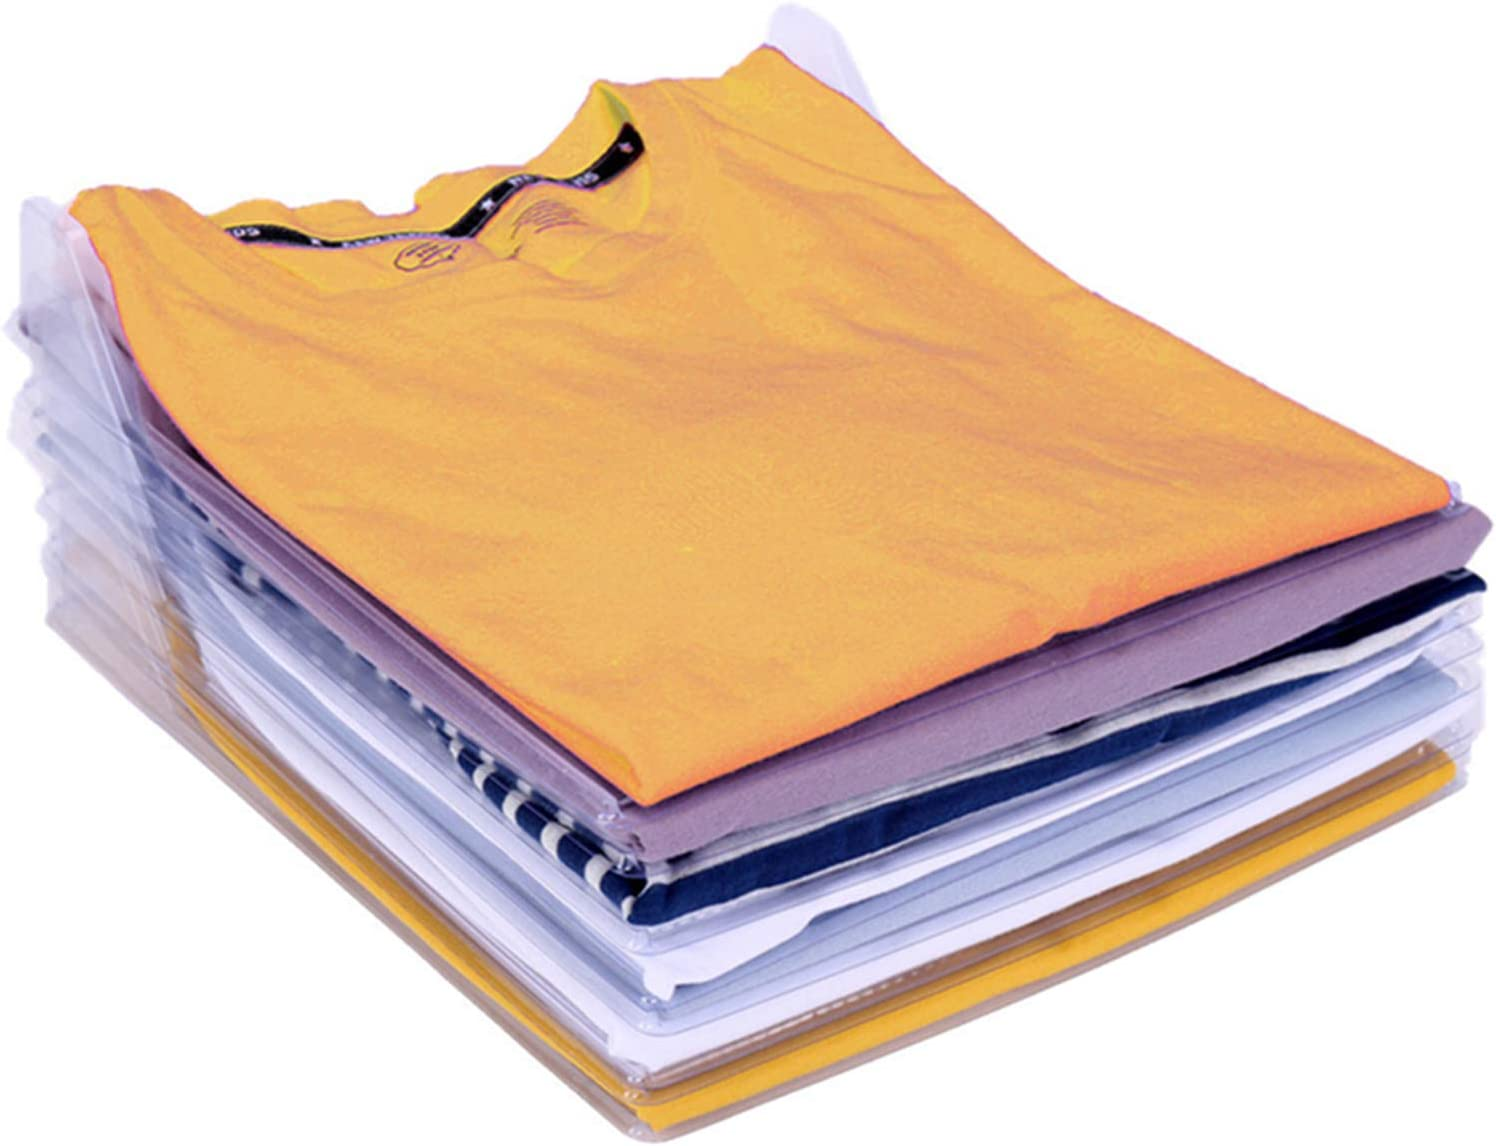 Nifogo Armario Organizador,Organizador de armarios,Organizador de Camisa Plegable,Camiseta Carpeta -Antiarrugas, para Guardar Ropa (60 Pack)